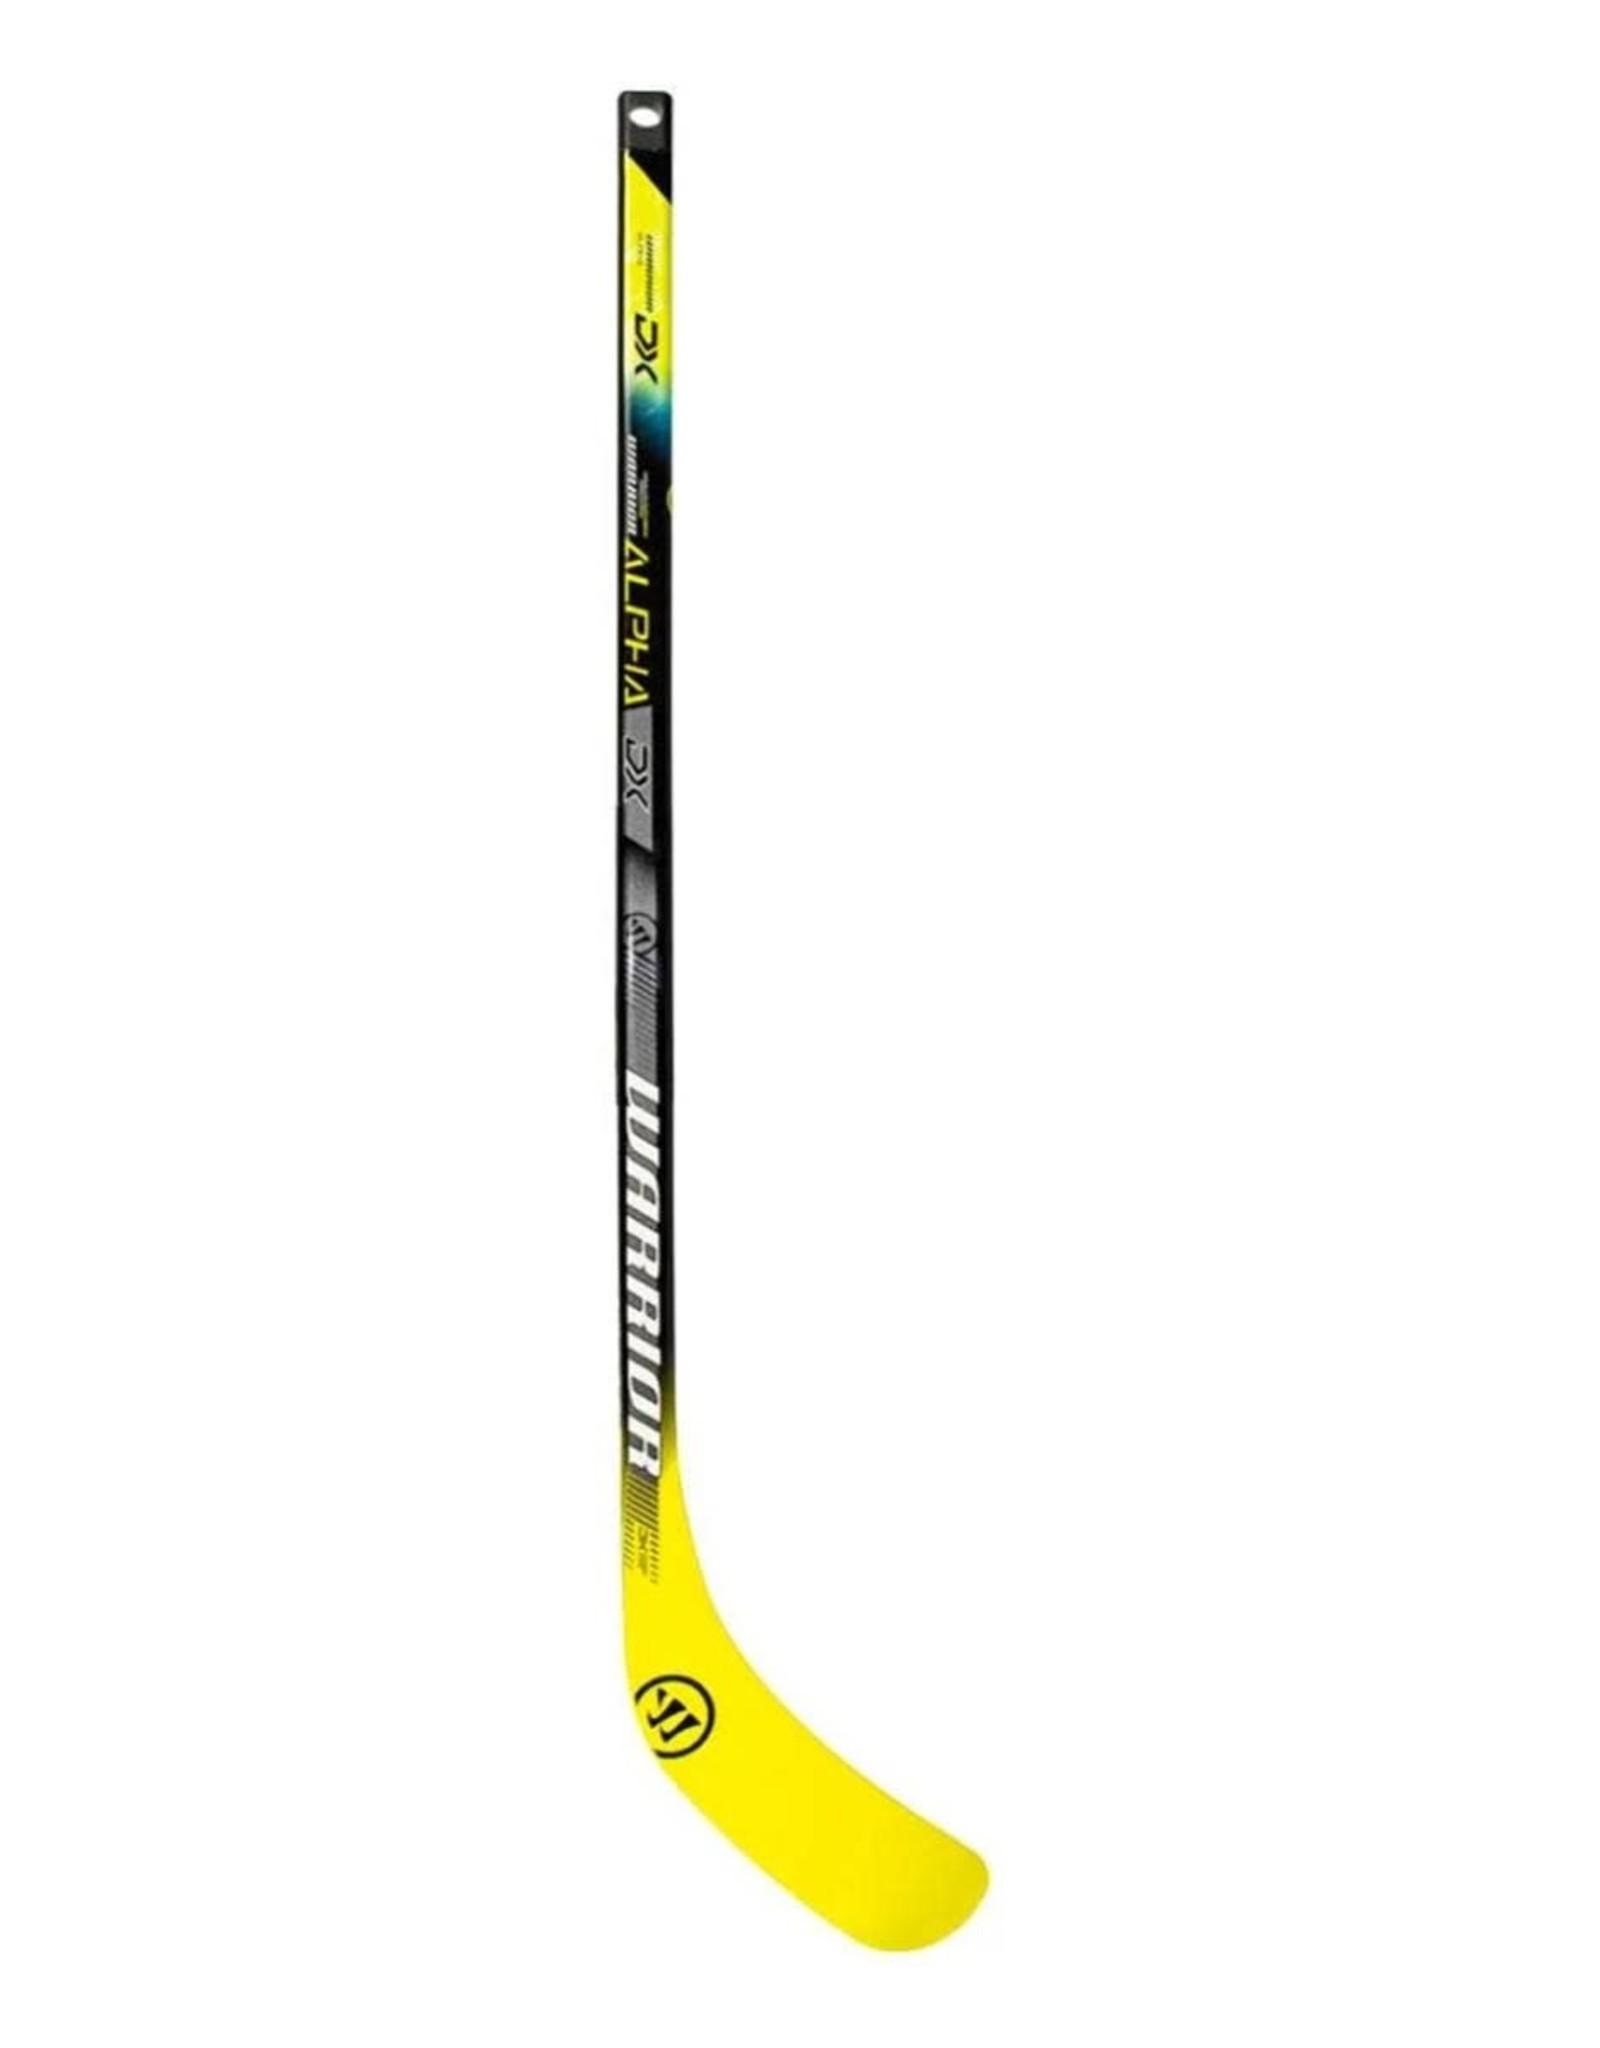 Warrior Warrior Alpha DX Mini Composite Stick Black/Yellow